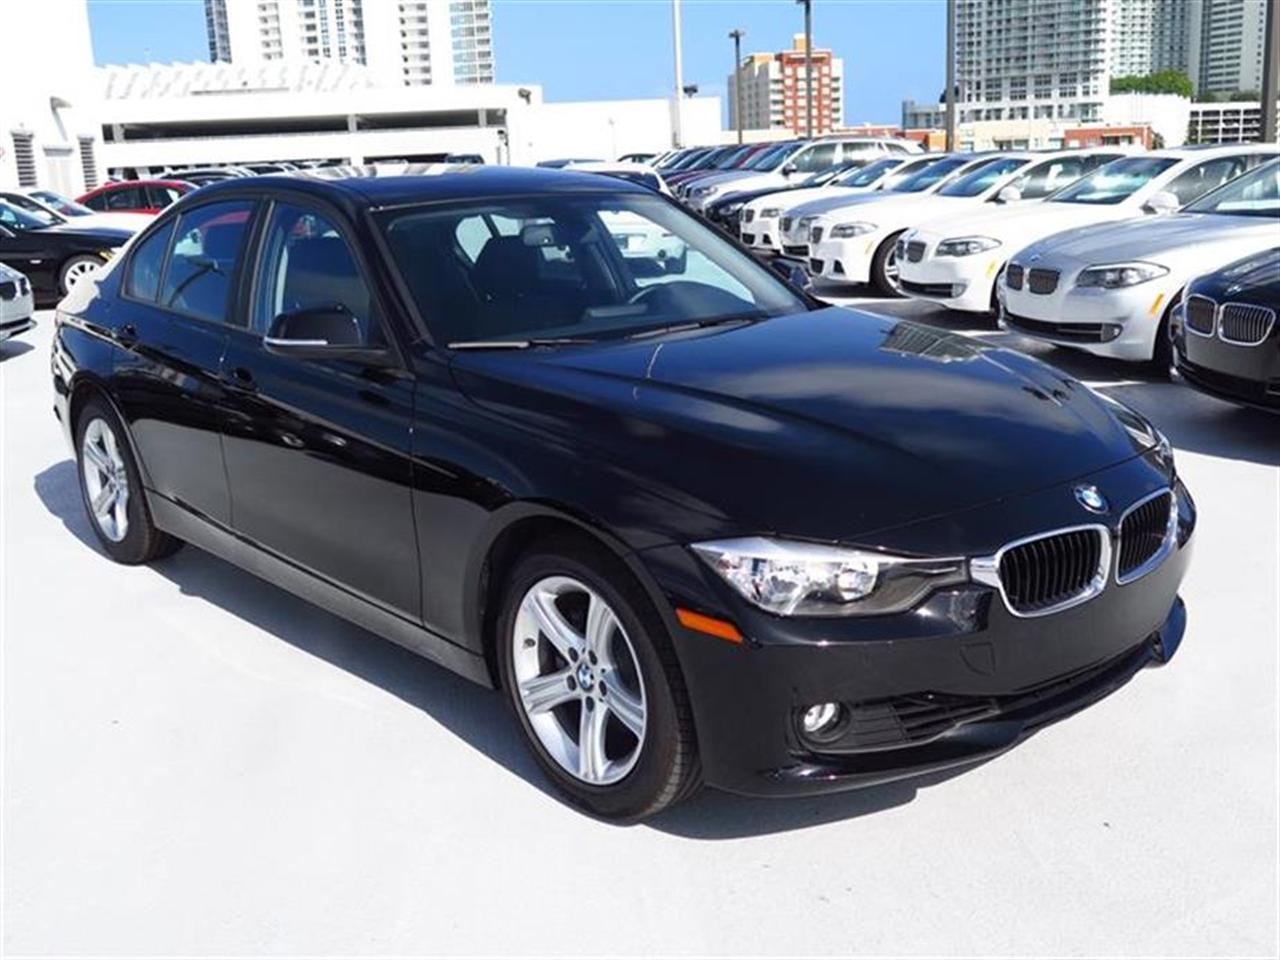 2014 BMW 3 SERIES 4dr Sdn 328i RWD 8794 miles 2 Seatback Storage Pockets 4 12V DC Power Outlets